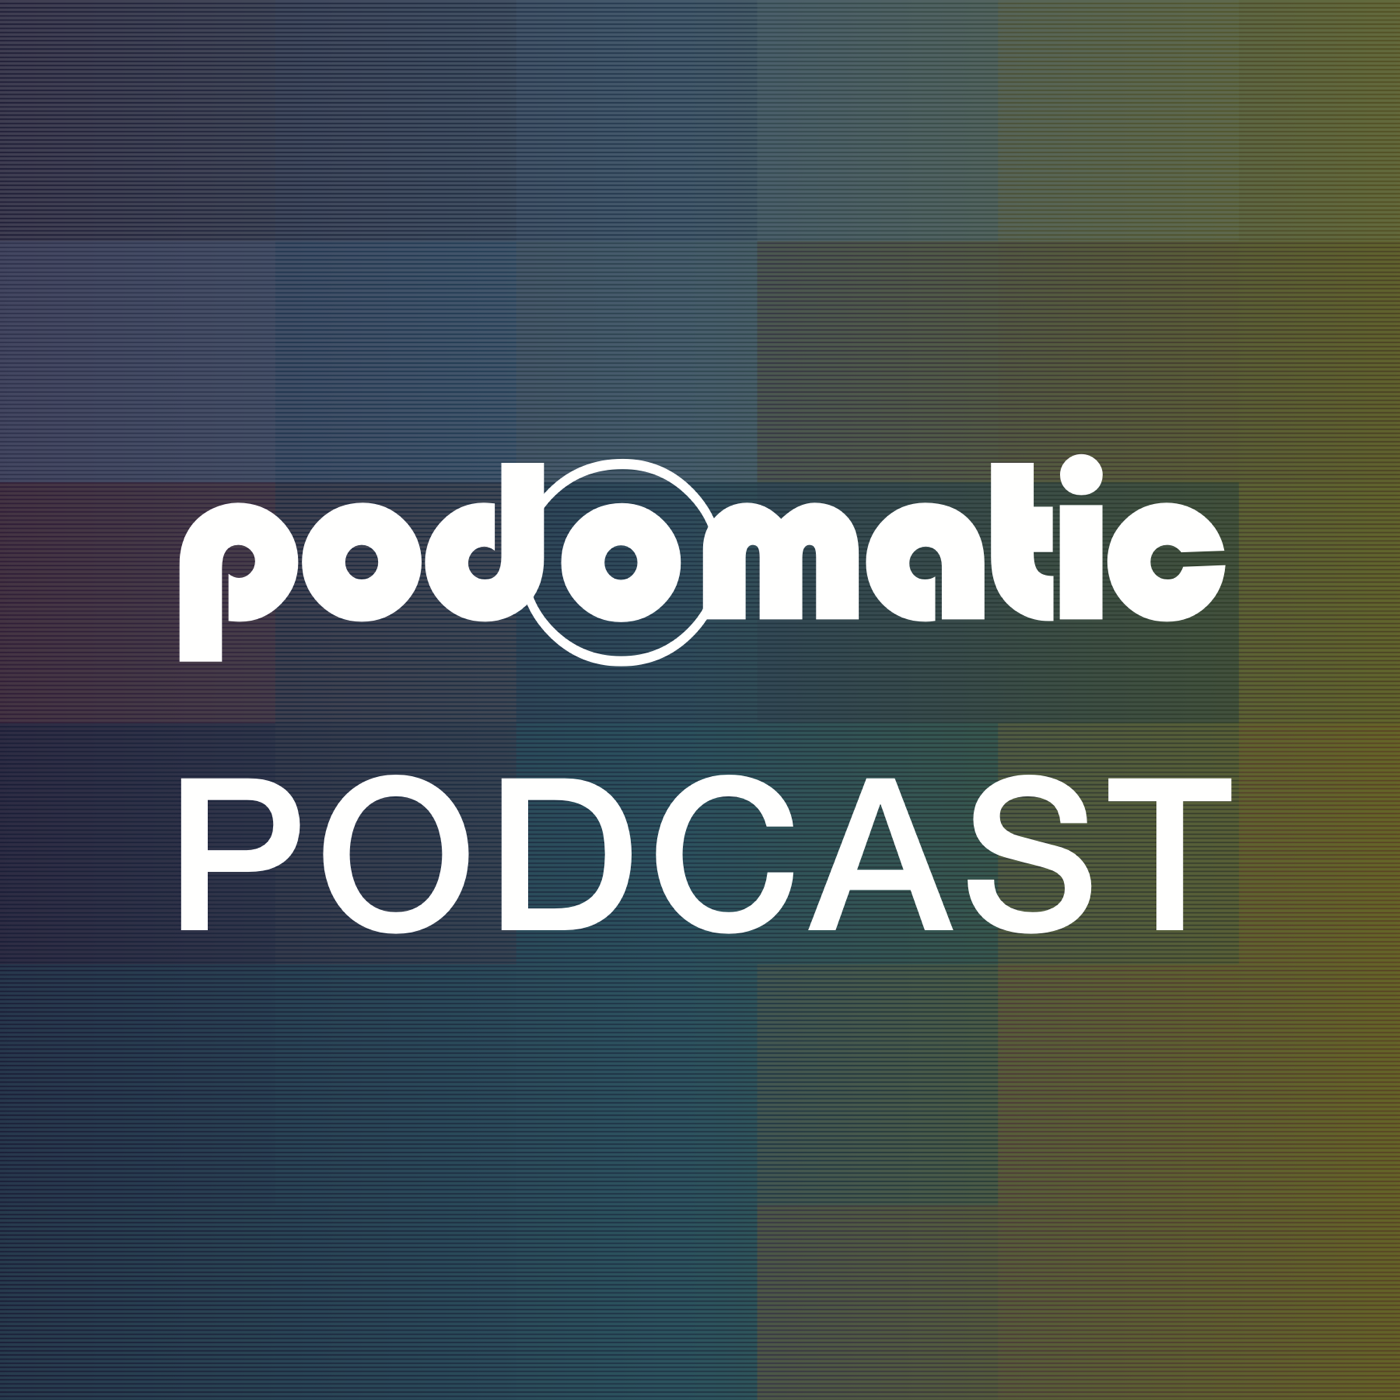 Mau Vidal's Podcast